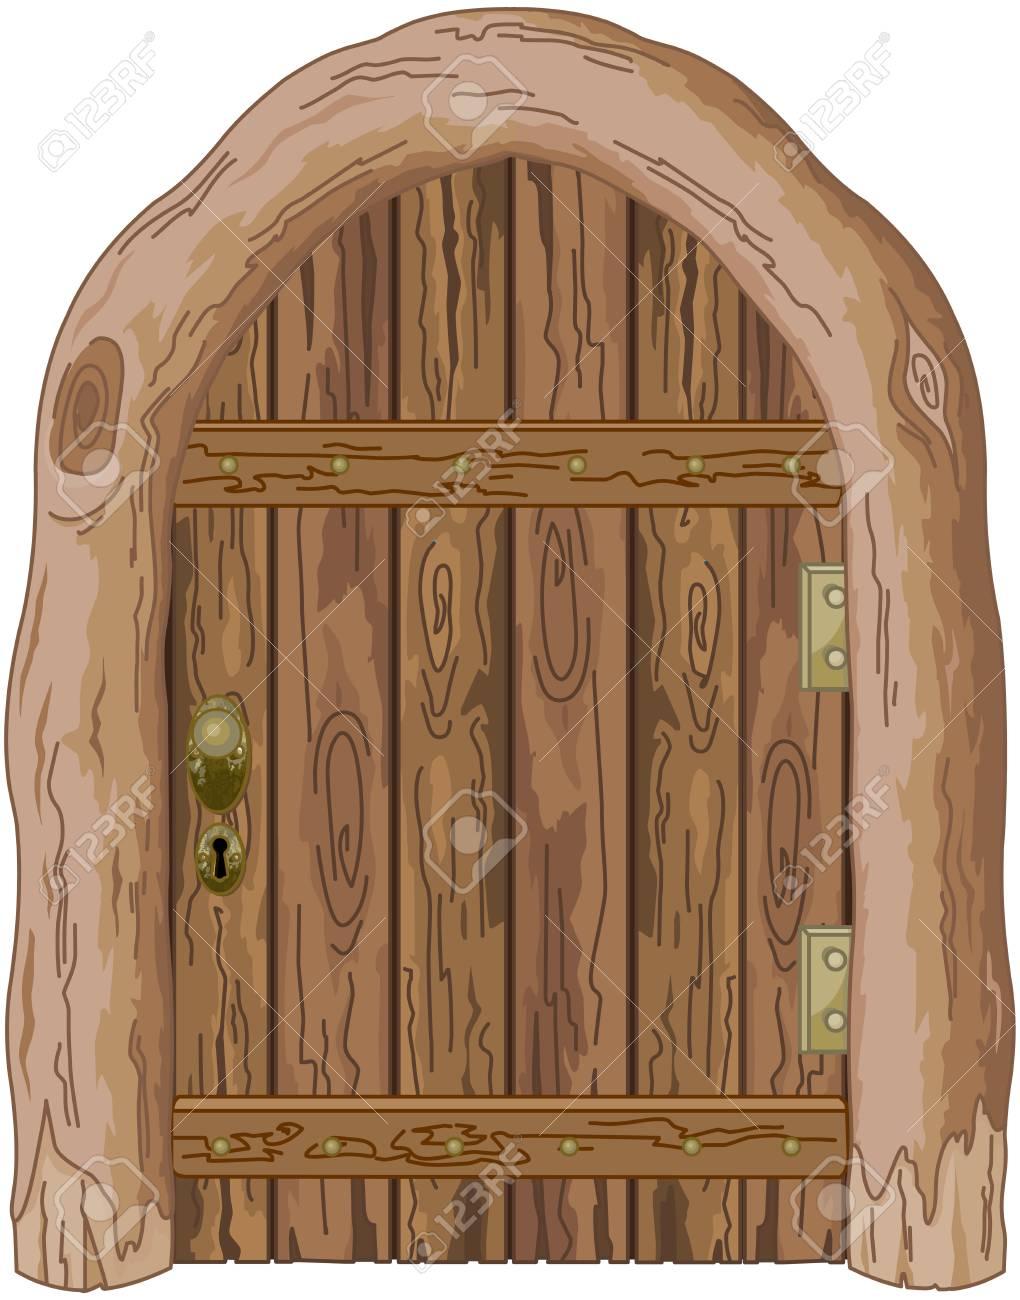 Illustration Of A Wooden Barn Door Royalty Free Cliparts Vectors